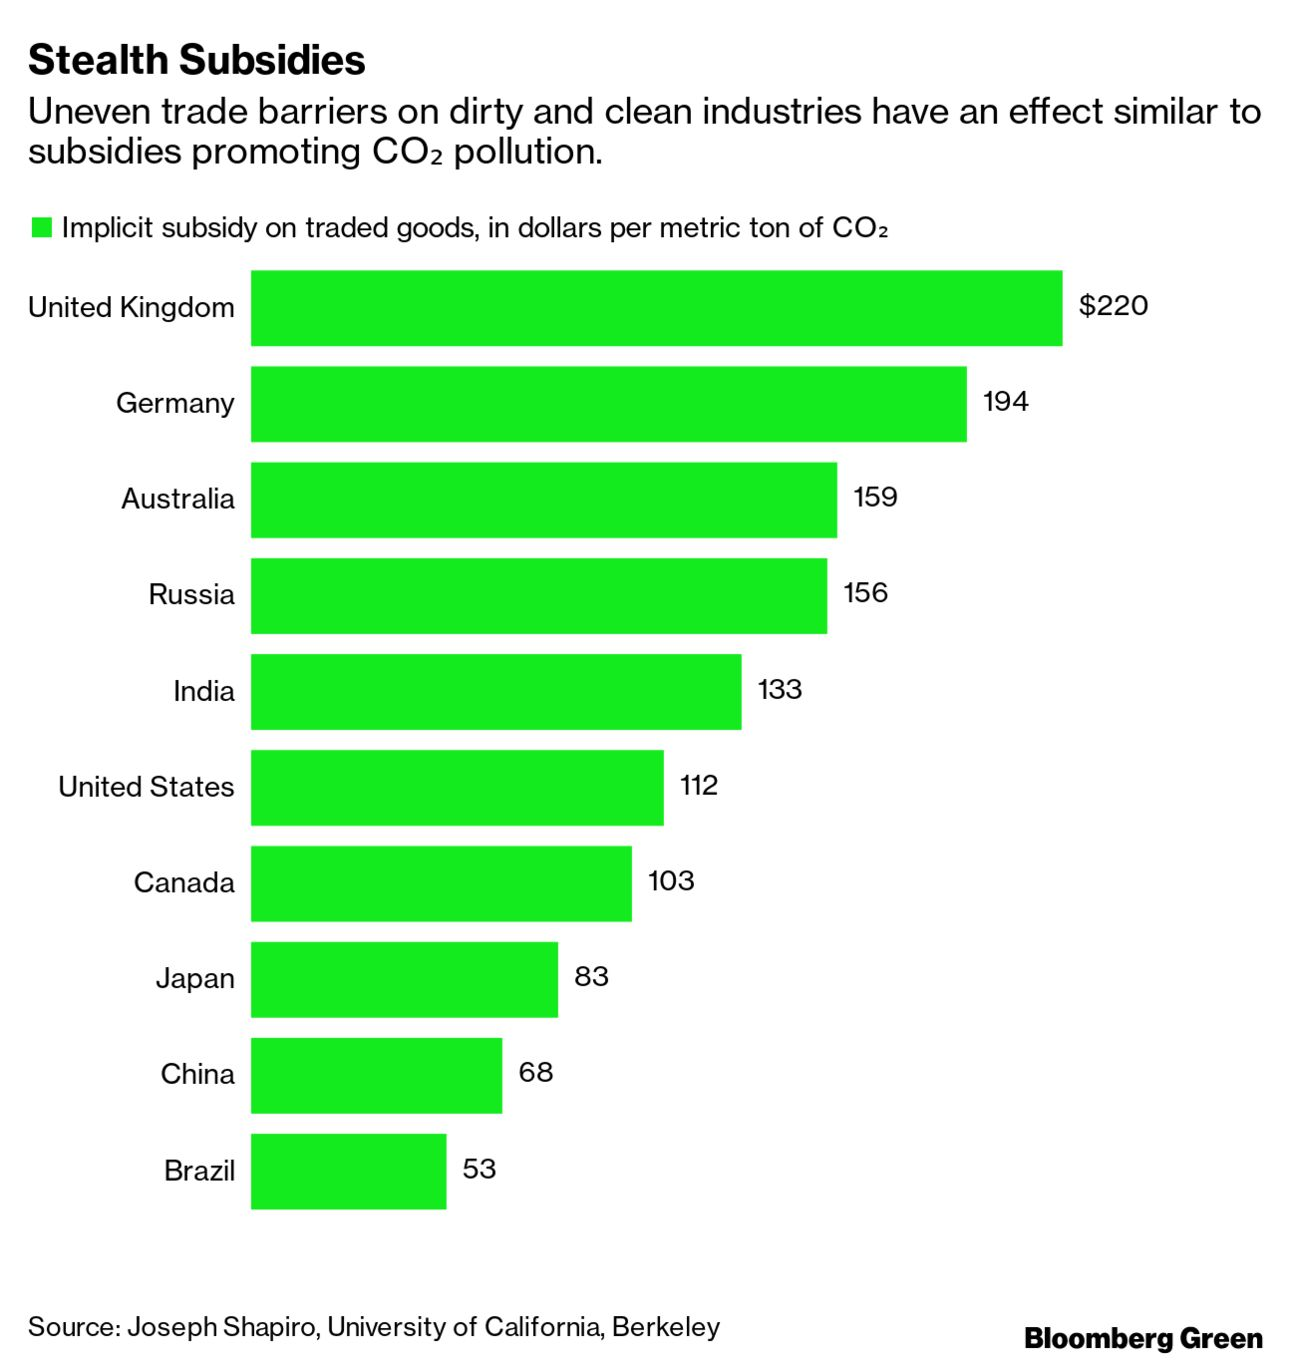 Stealth Subsidies